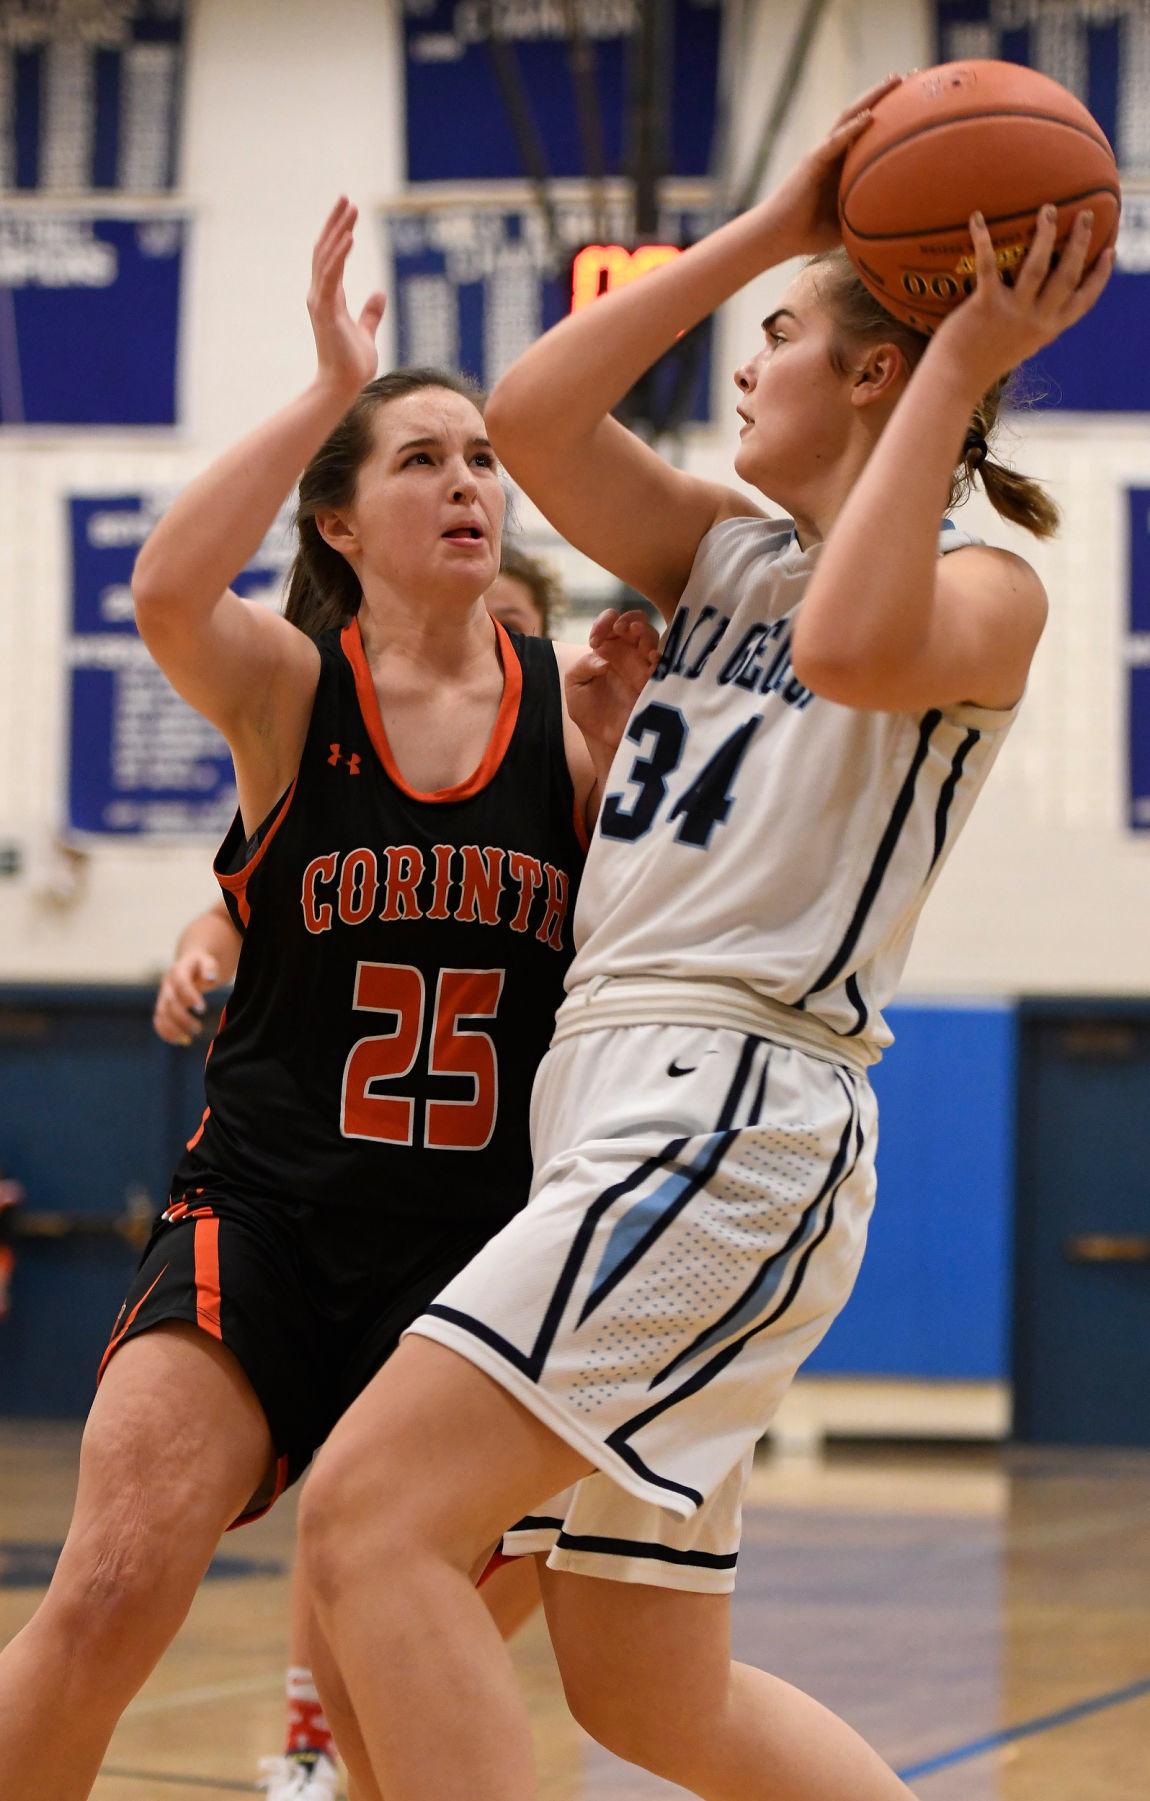 Corinth vs. Lake George girls basketball